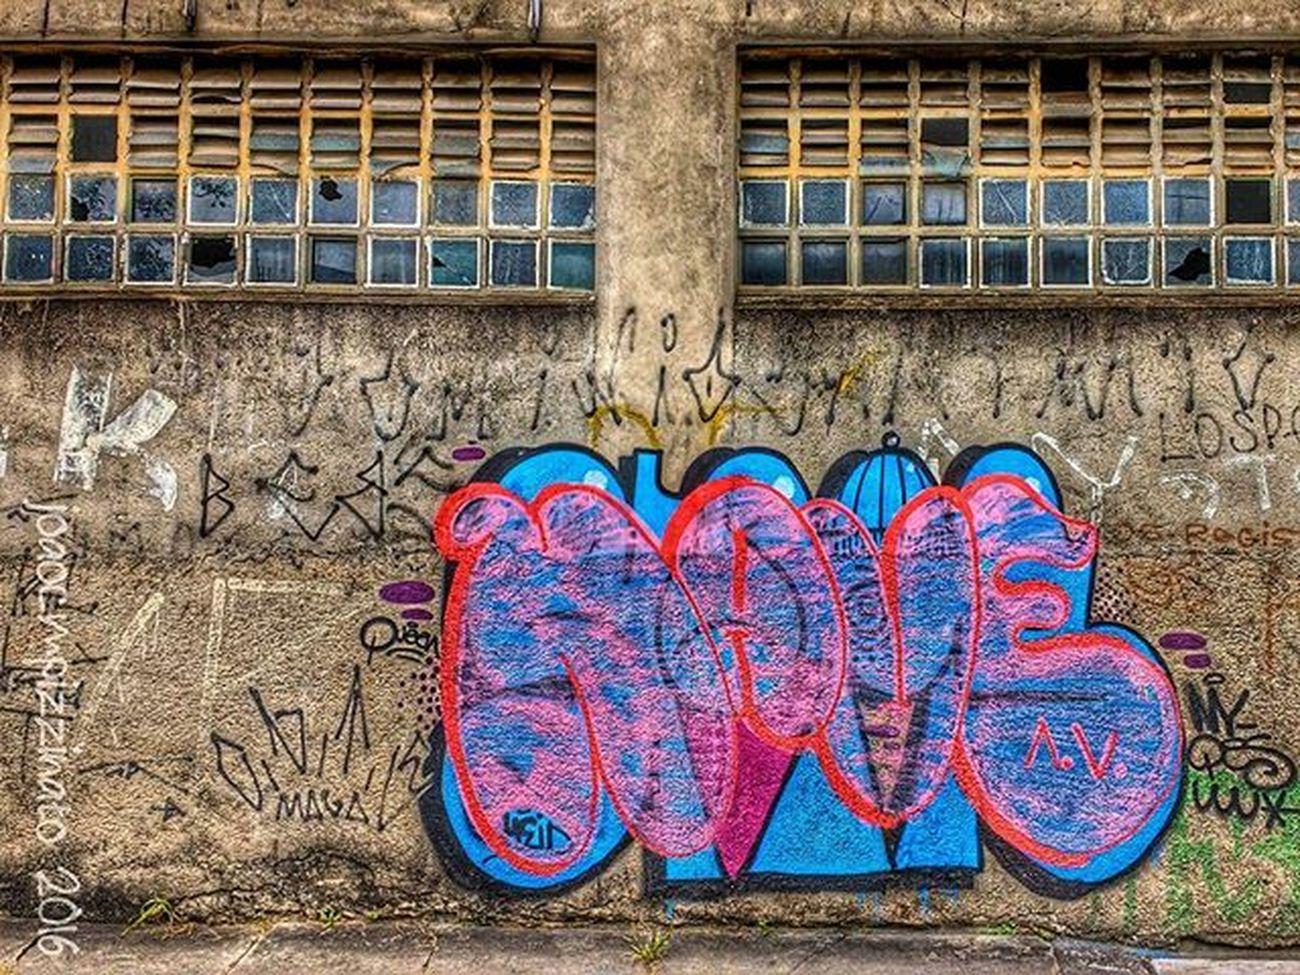 Urbex_utopia Jj_urbex Jj_sampa Jj_abandoned Trailblazers_urbex Rsa_preciousjunk Streetphoto_brasil Colors City Zonasul Saopaulo Brasil Graffiti Graffitiart Art Streetart UrbanART Urbexbrasil Urbexsp Mundoruasp Olhonaruasp Flaming_abstracts